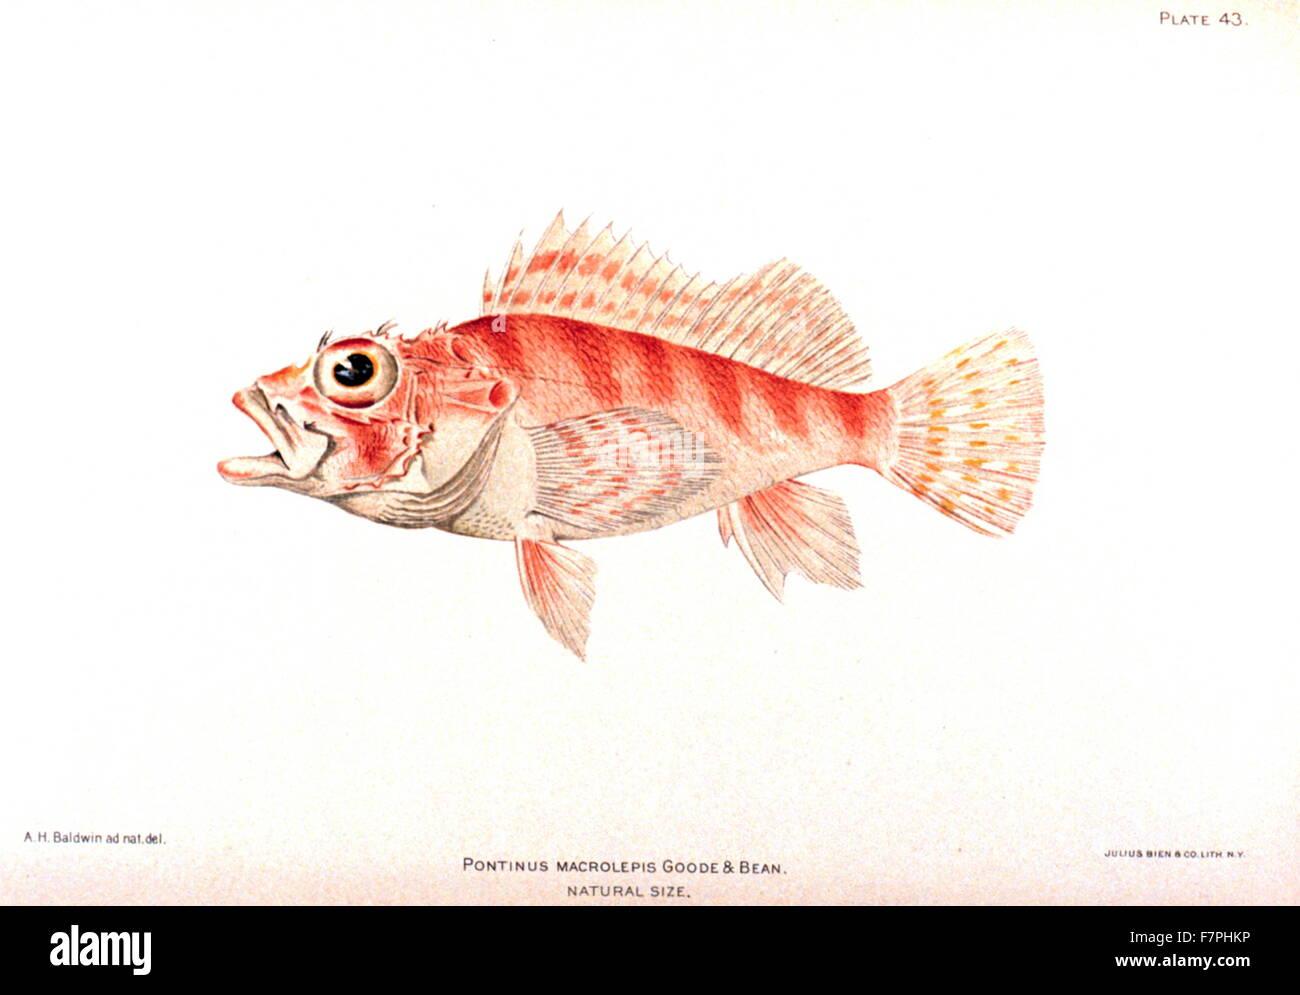 Viele Fische datieren Website sicher skype dating India